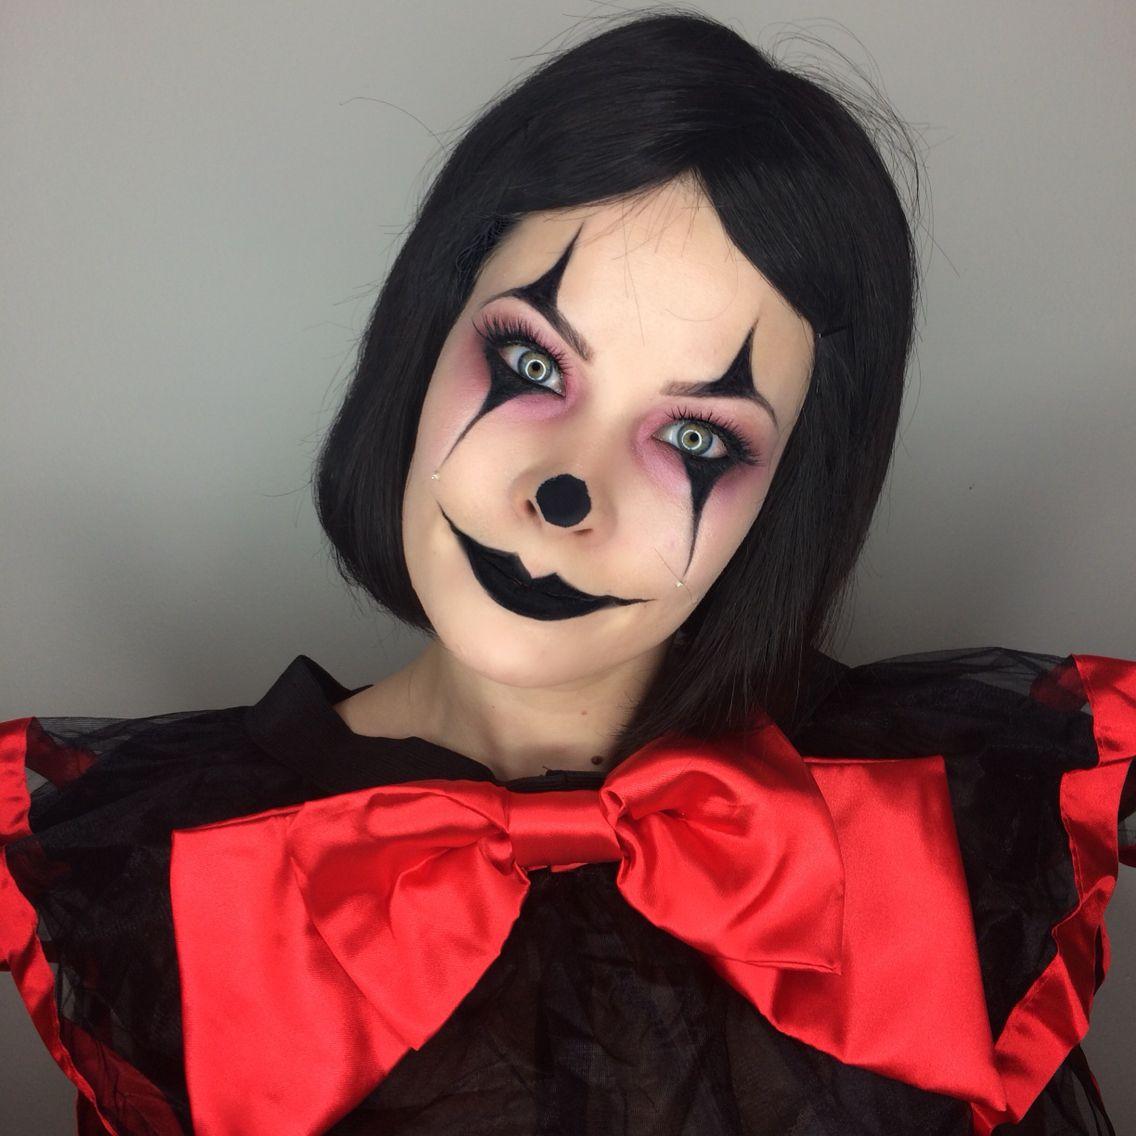 Crazy clown makeup for Halloween by makeupartist411